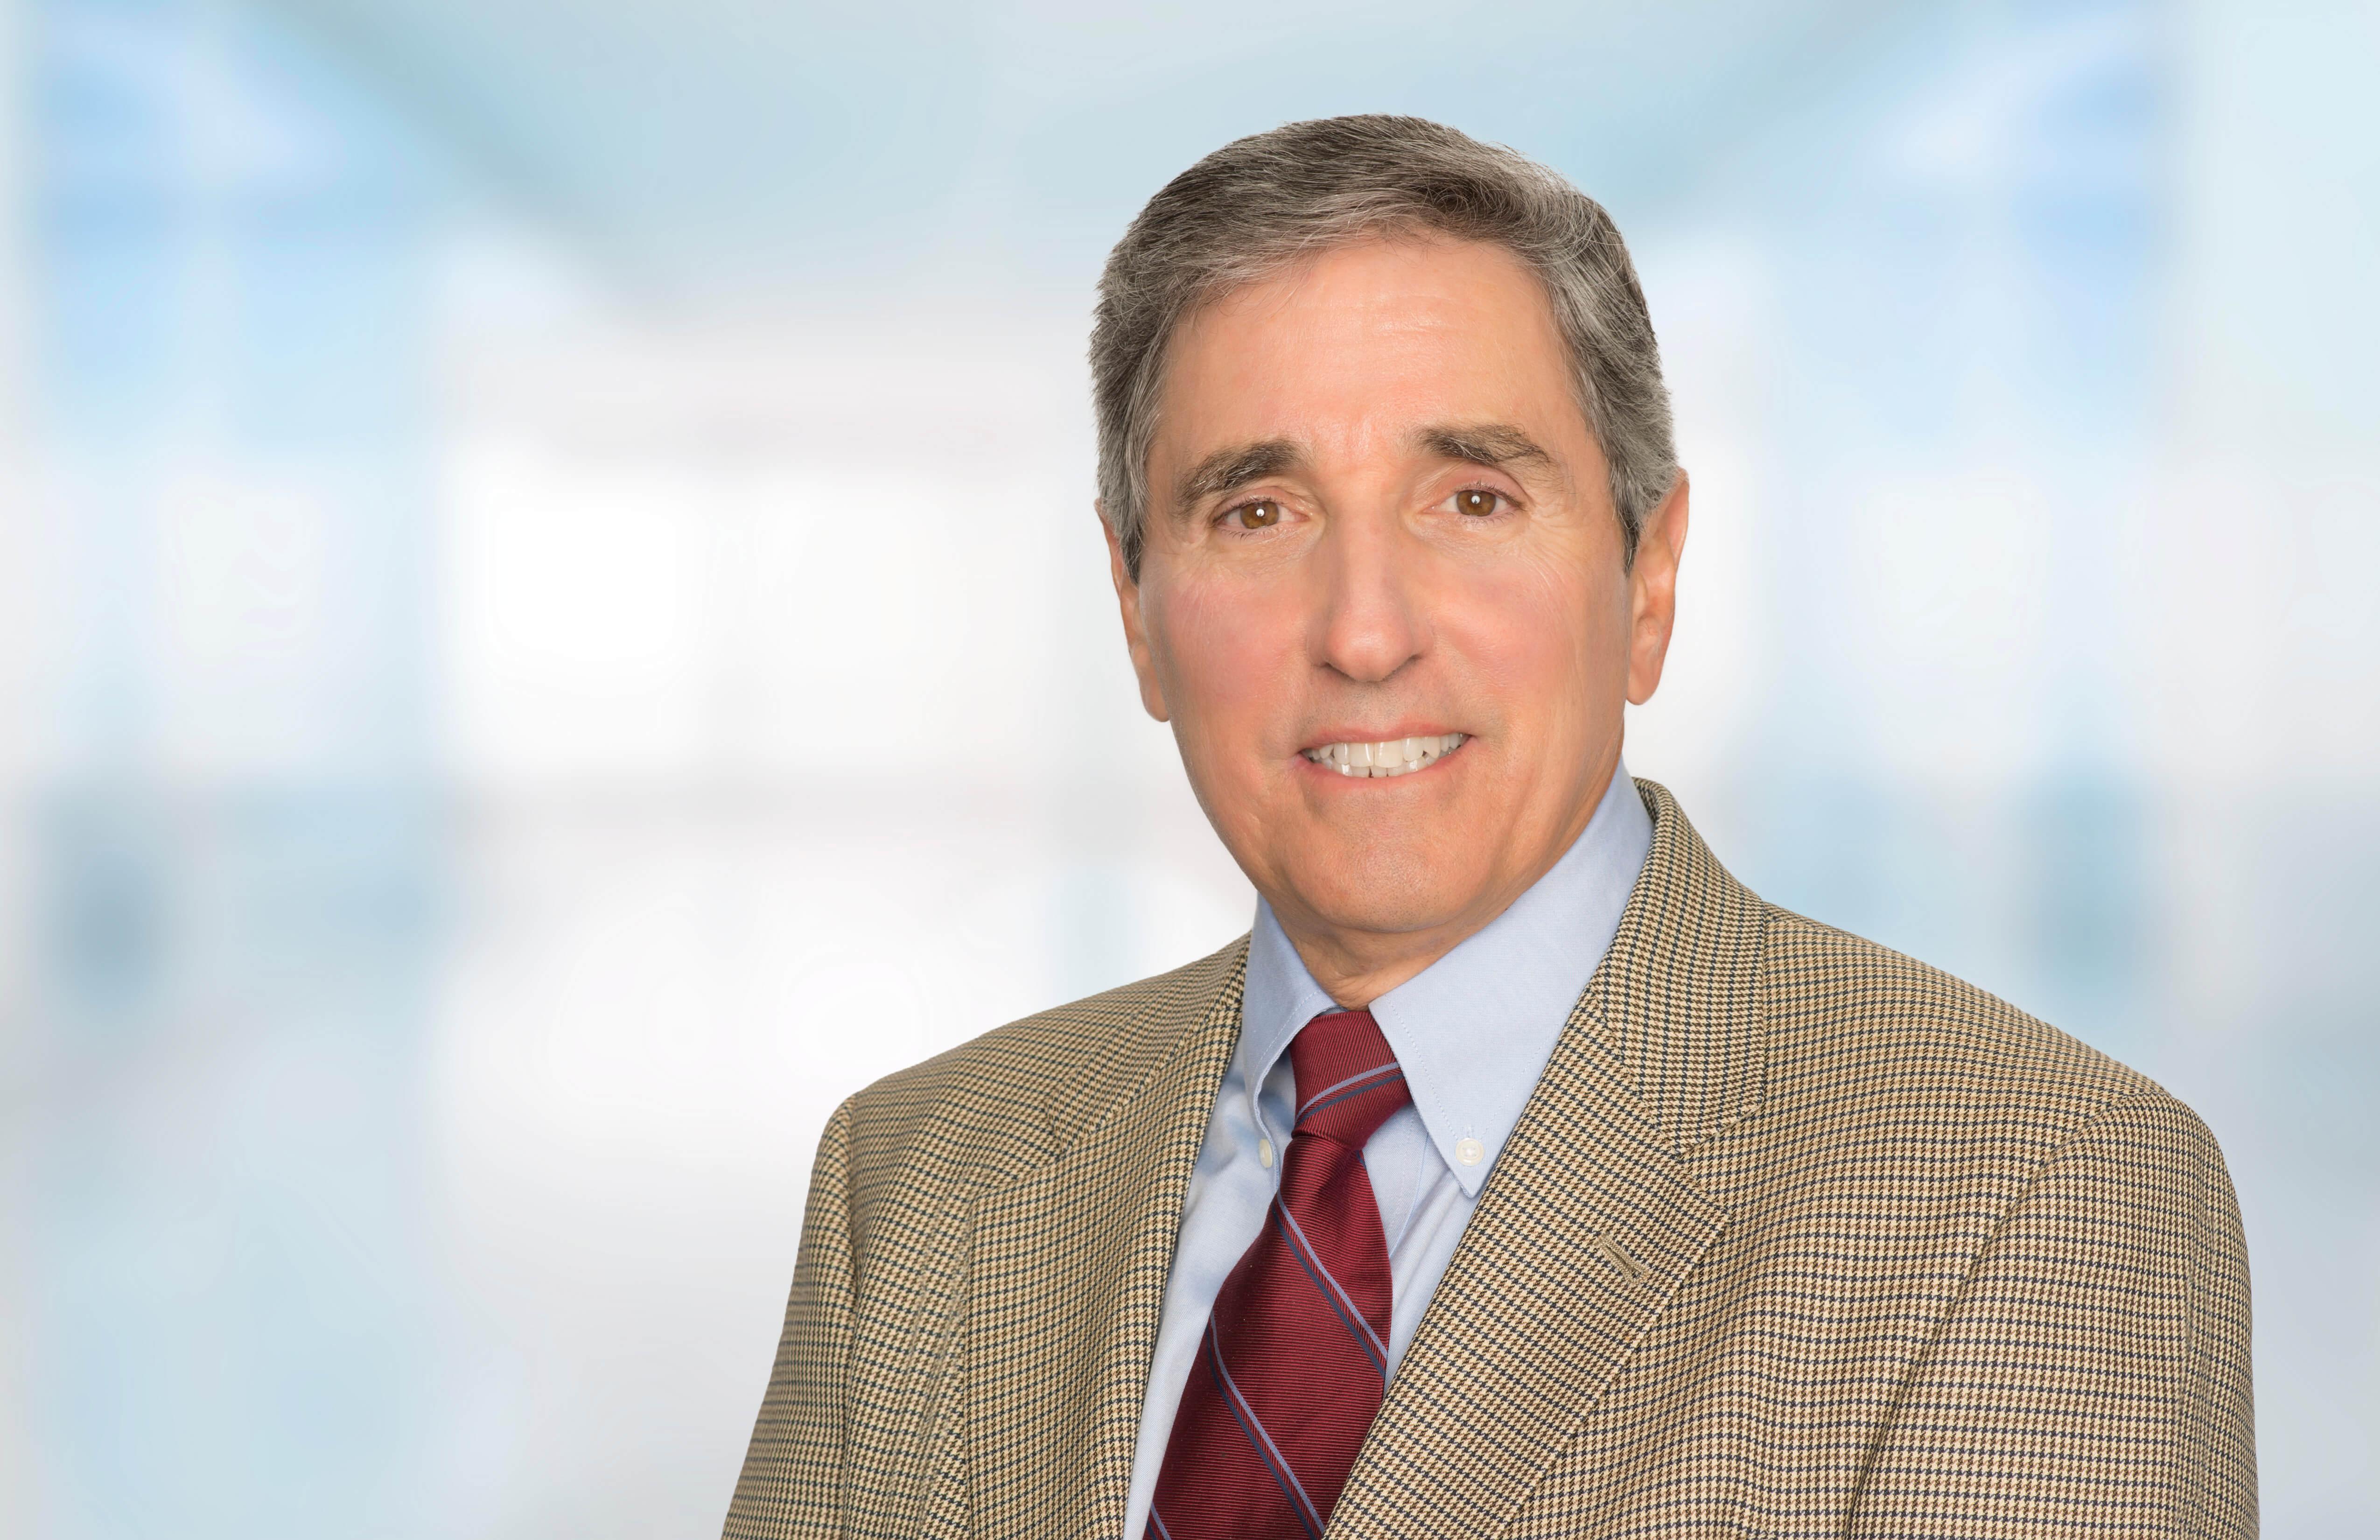 Denis A. Cortese